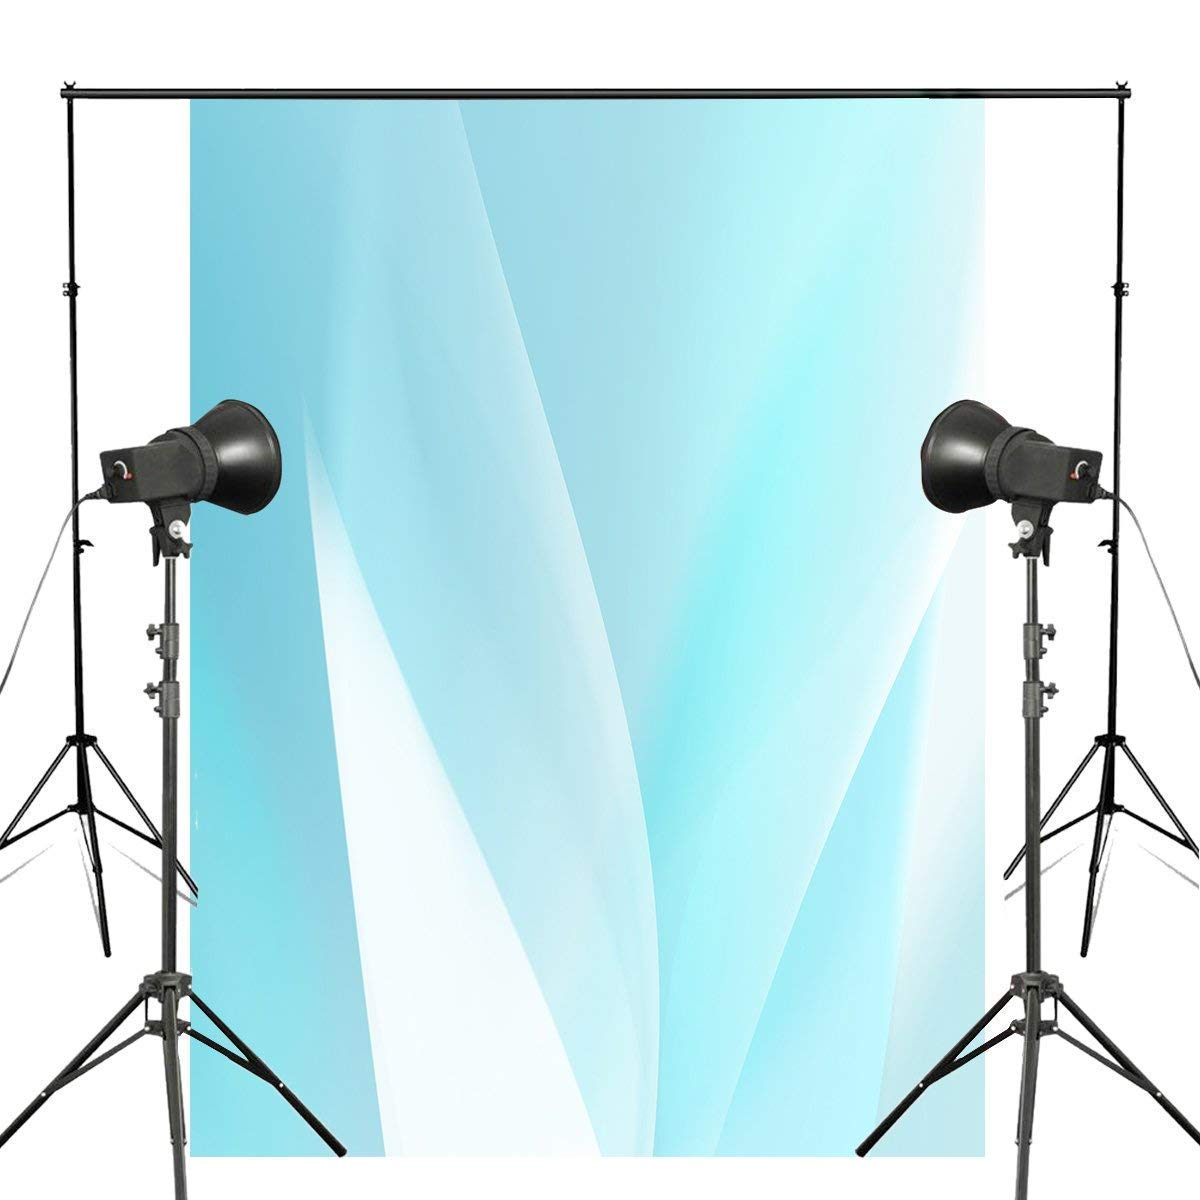 ERTIANANG 5x7ft Abstract Photography Backdrop Light Blue Background Art Photo Studio Backdrop Wall